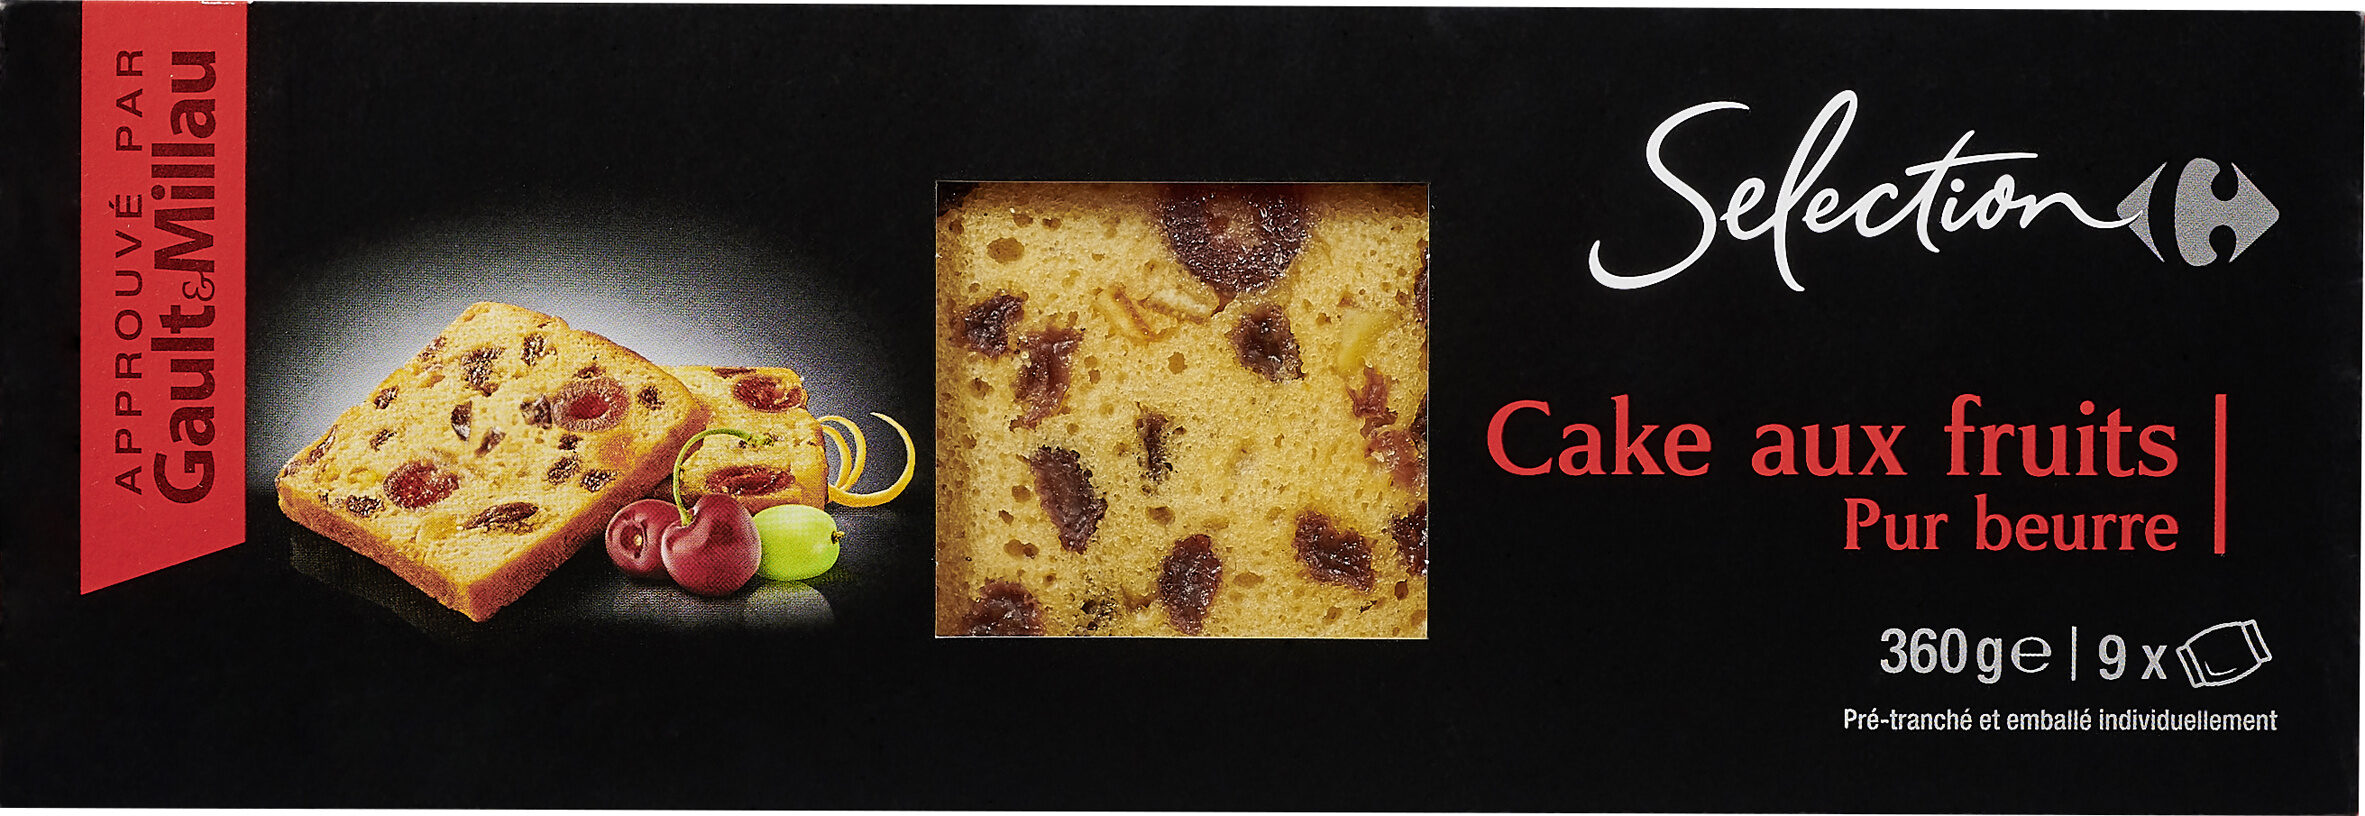 Cake aux fruits pur beurre - Product - fr